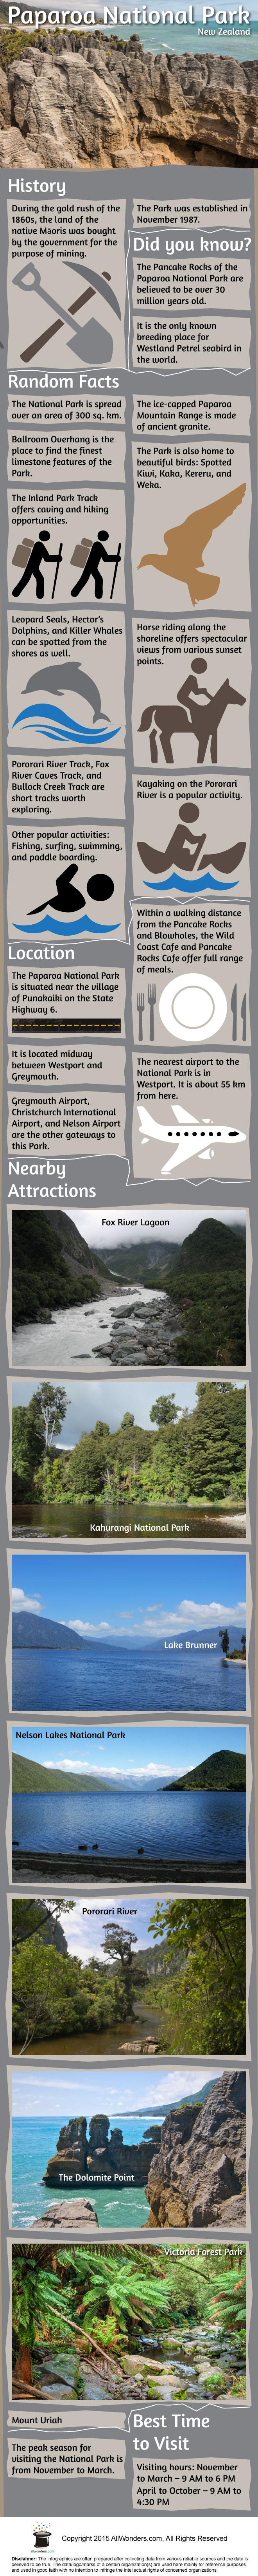 Paparoa National Park Infographic